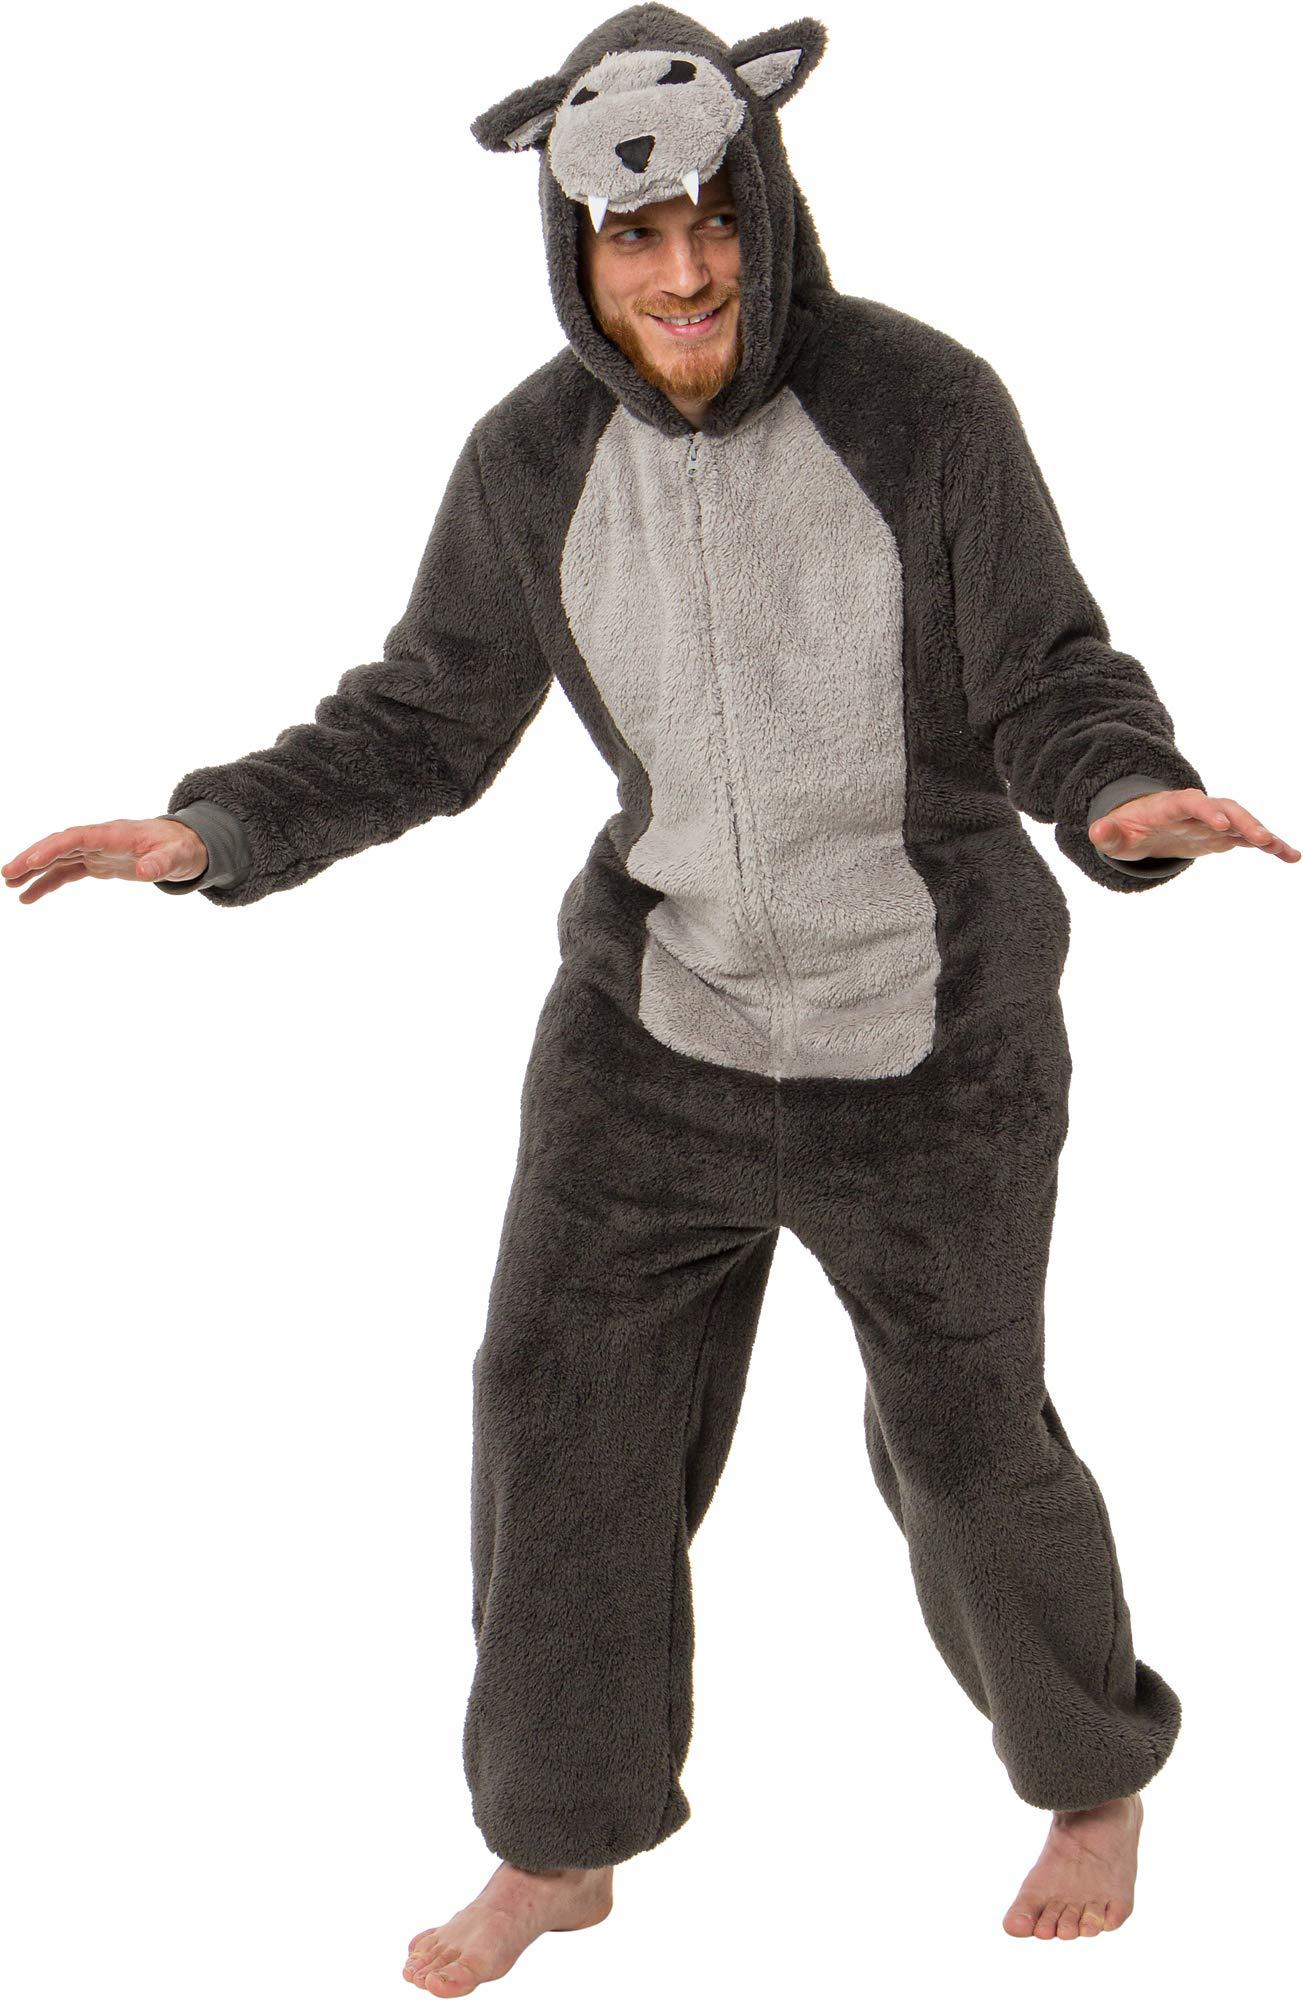 Silver Lilly Plush One Piece Werewolf Costume - Unisex Adult Halloween Animal Pajamas